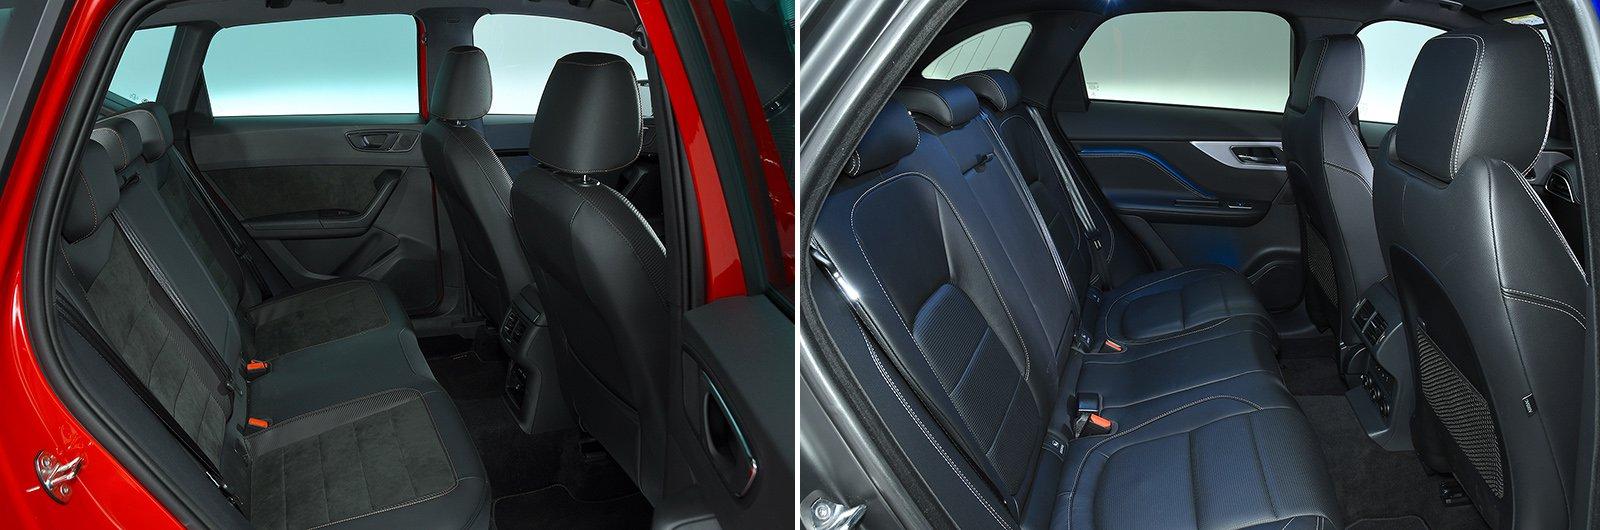 New Cupra Ateca vs used Jaguar F-Pace rear seats